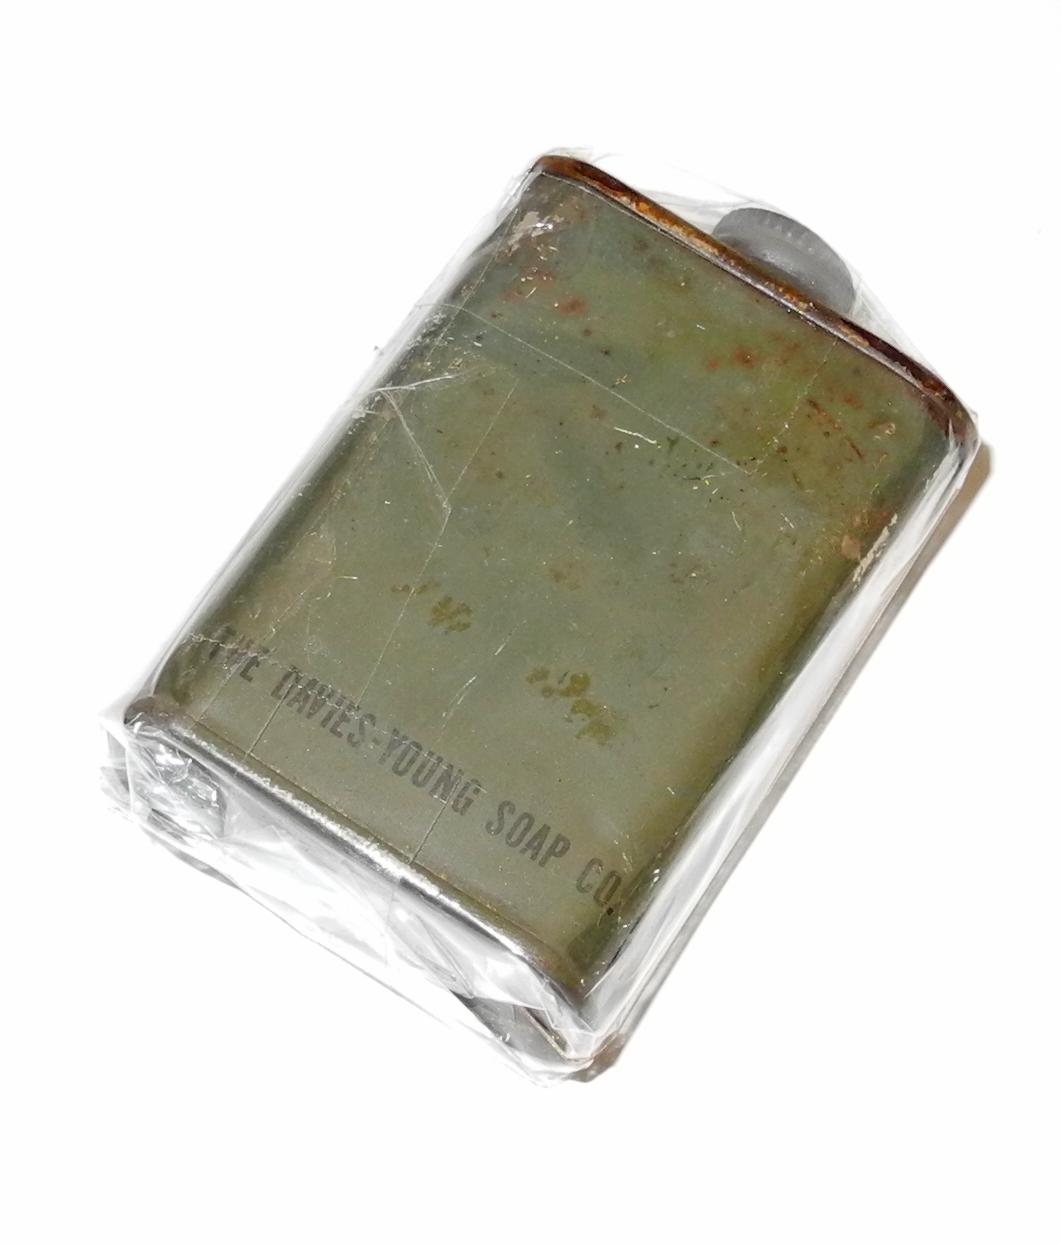 AAF C-1 vest insect repellent